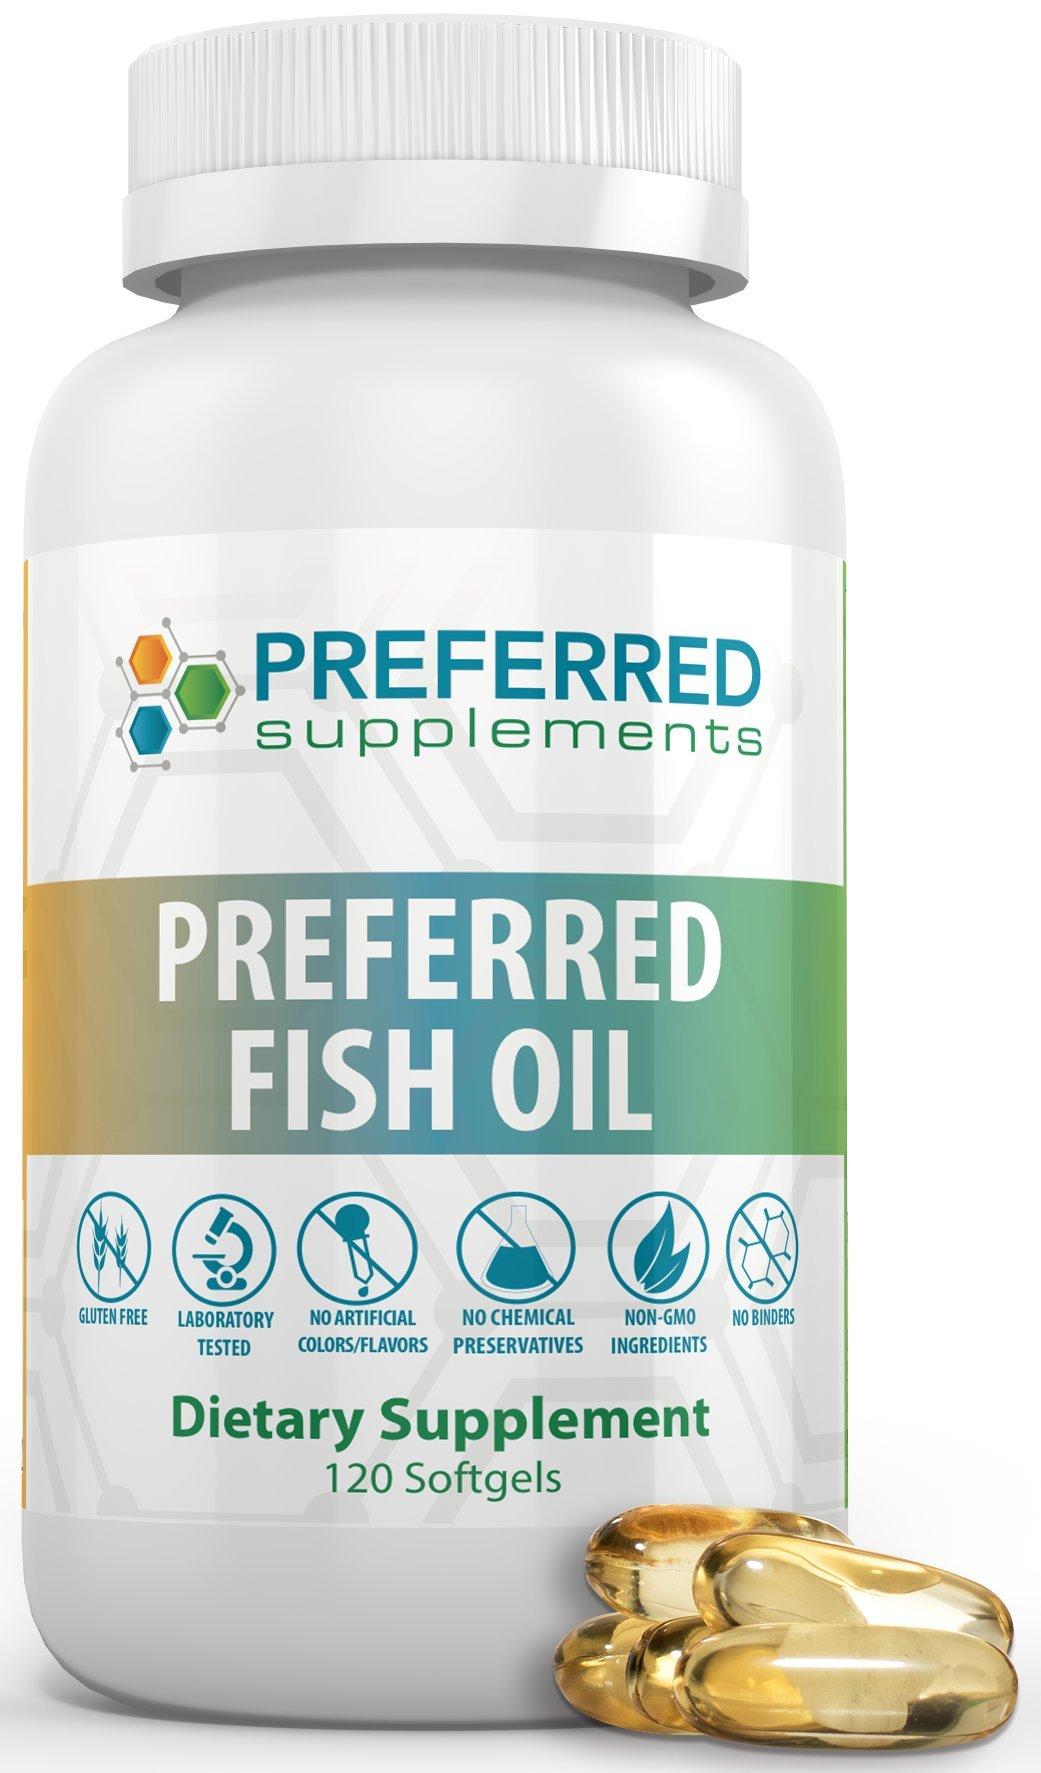 Amazon.com: Preferred Supplements- Vitamin D3 2,000 IU